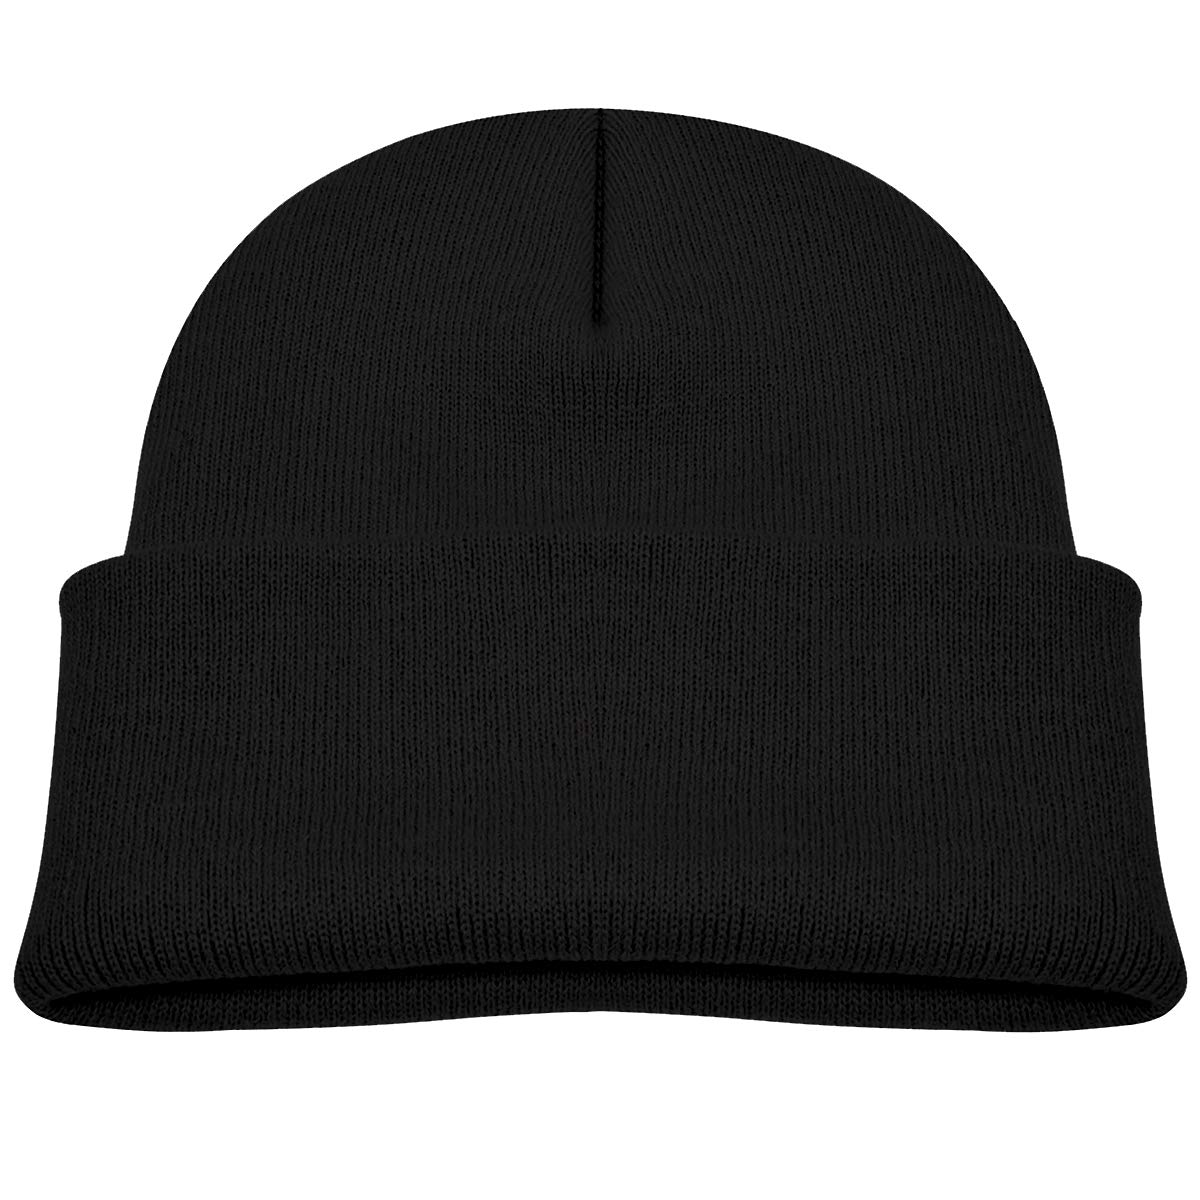 Amazon.com  Fzjy Wnx I m 1 Year Old Baby Beanies Caps Knit Hat  Clothing ccb06957cf8